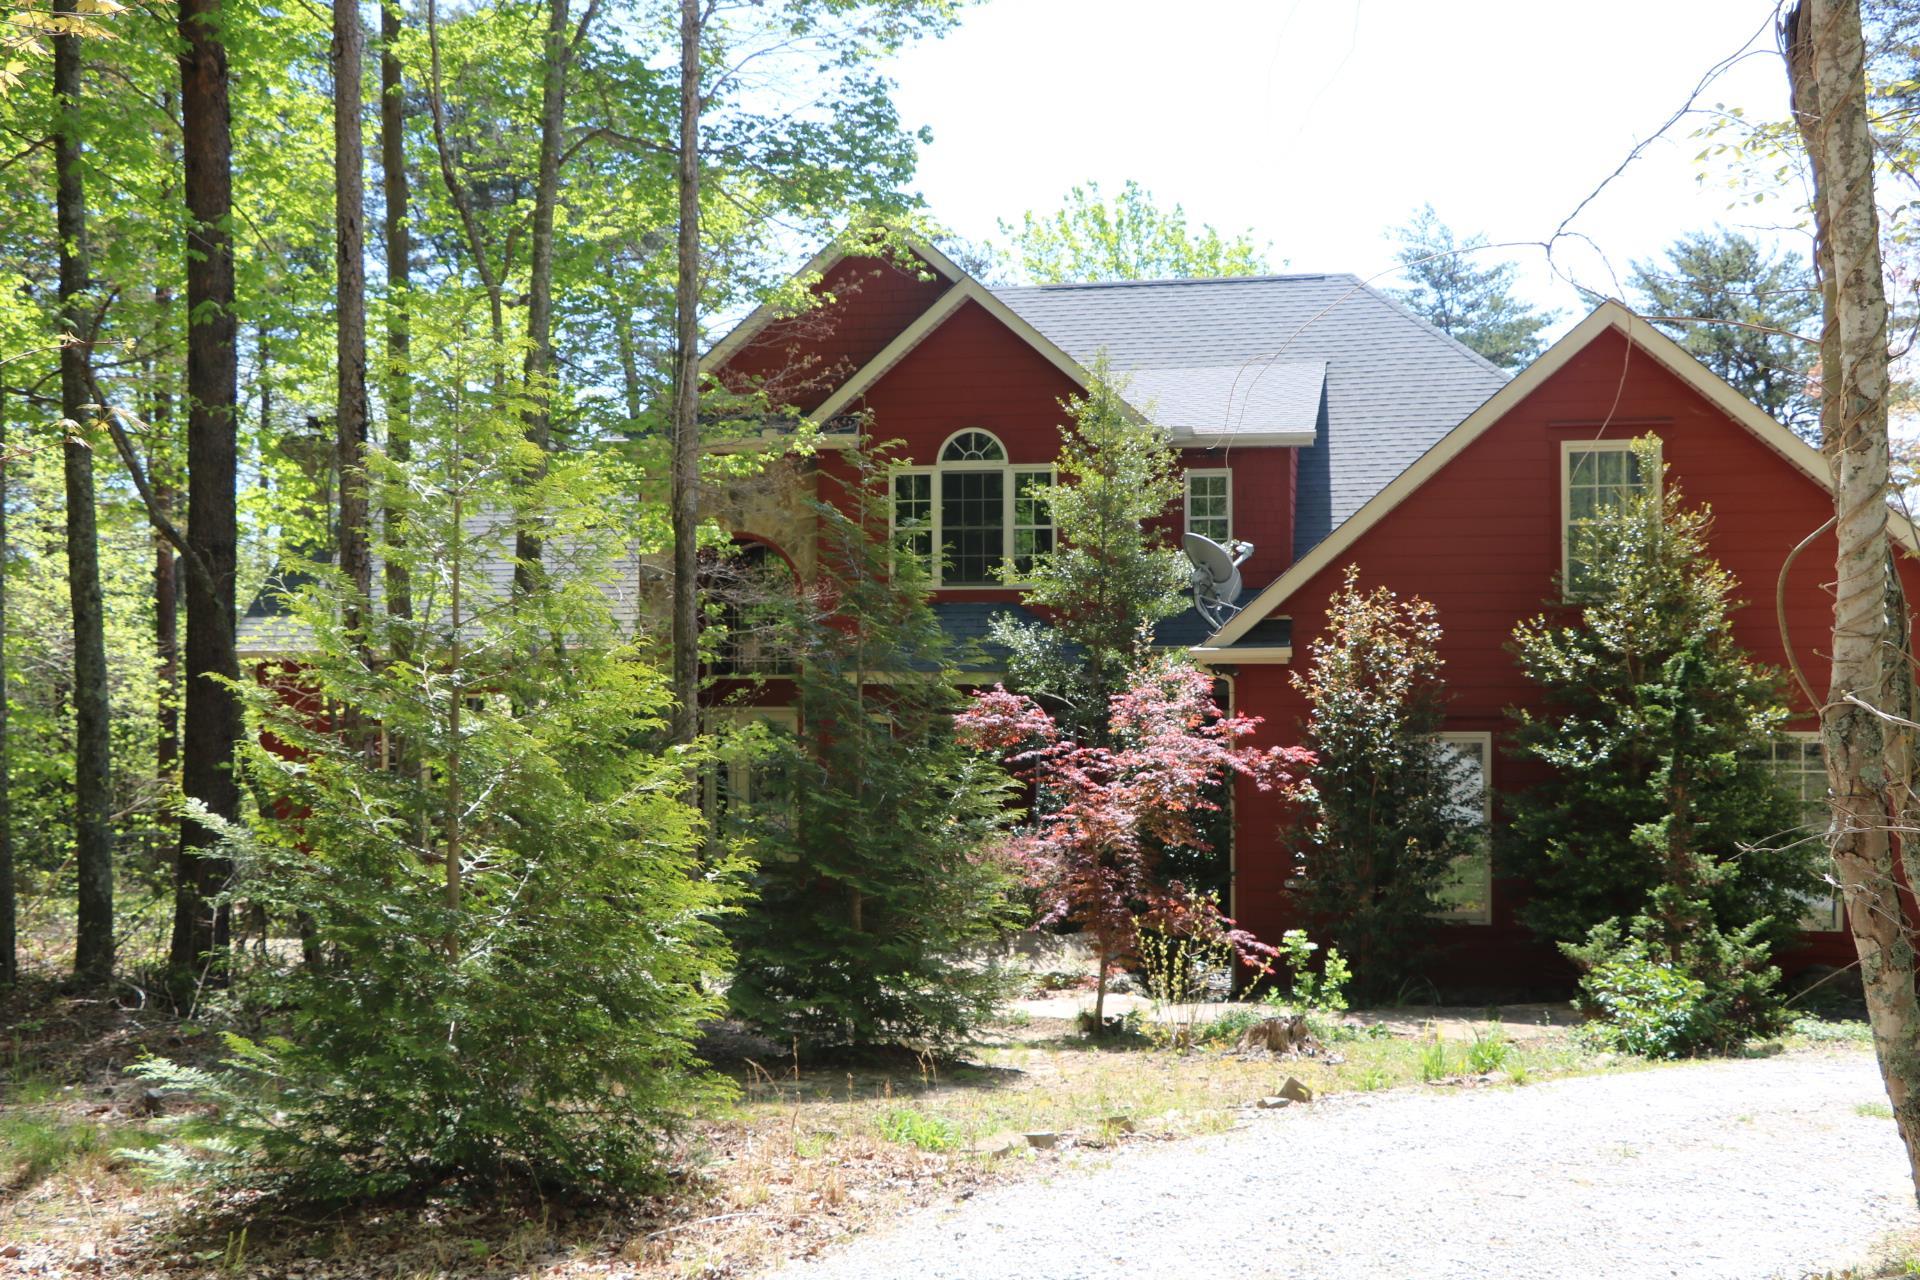 29 N Rim Dr, N, Coalmont, TN 37313 - Coalmont, TN real estate listing